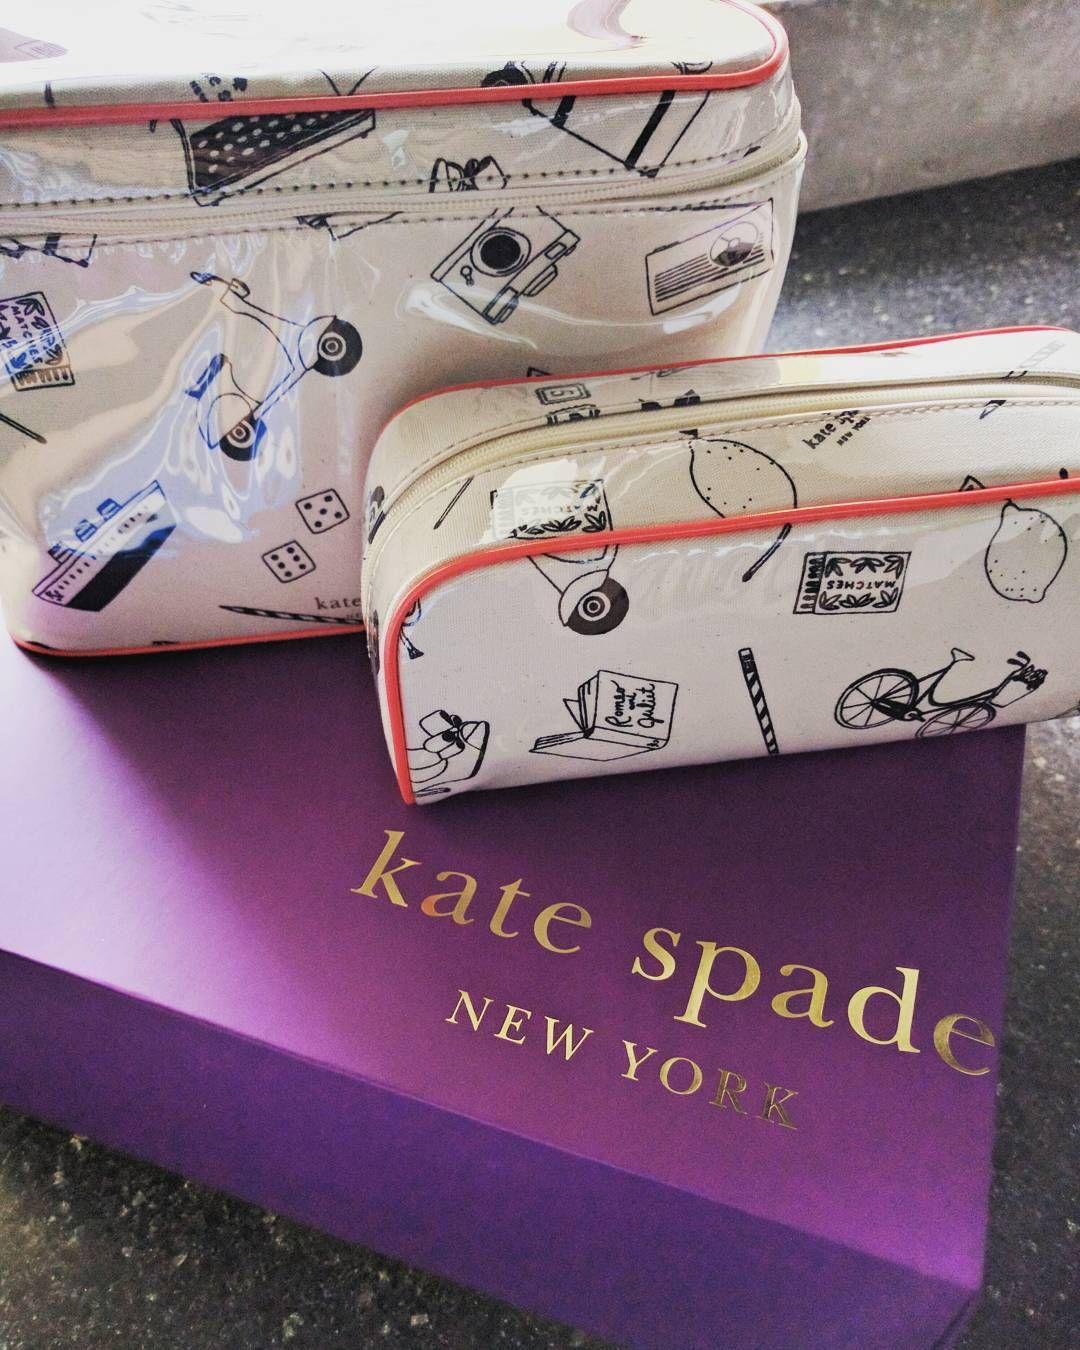 Kate Spade cosmetic bags #katespade #ireallydidntneedit #livecolorfully